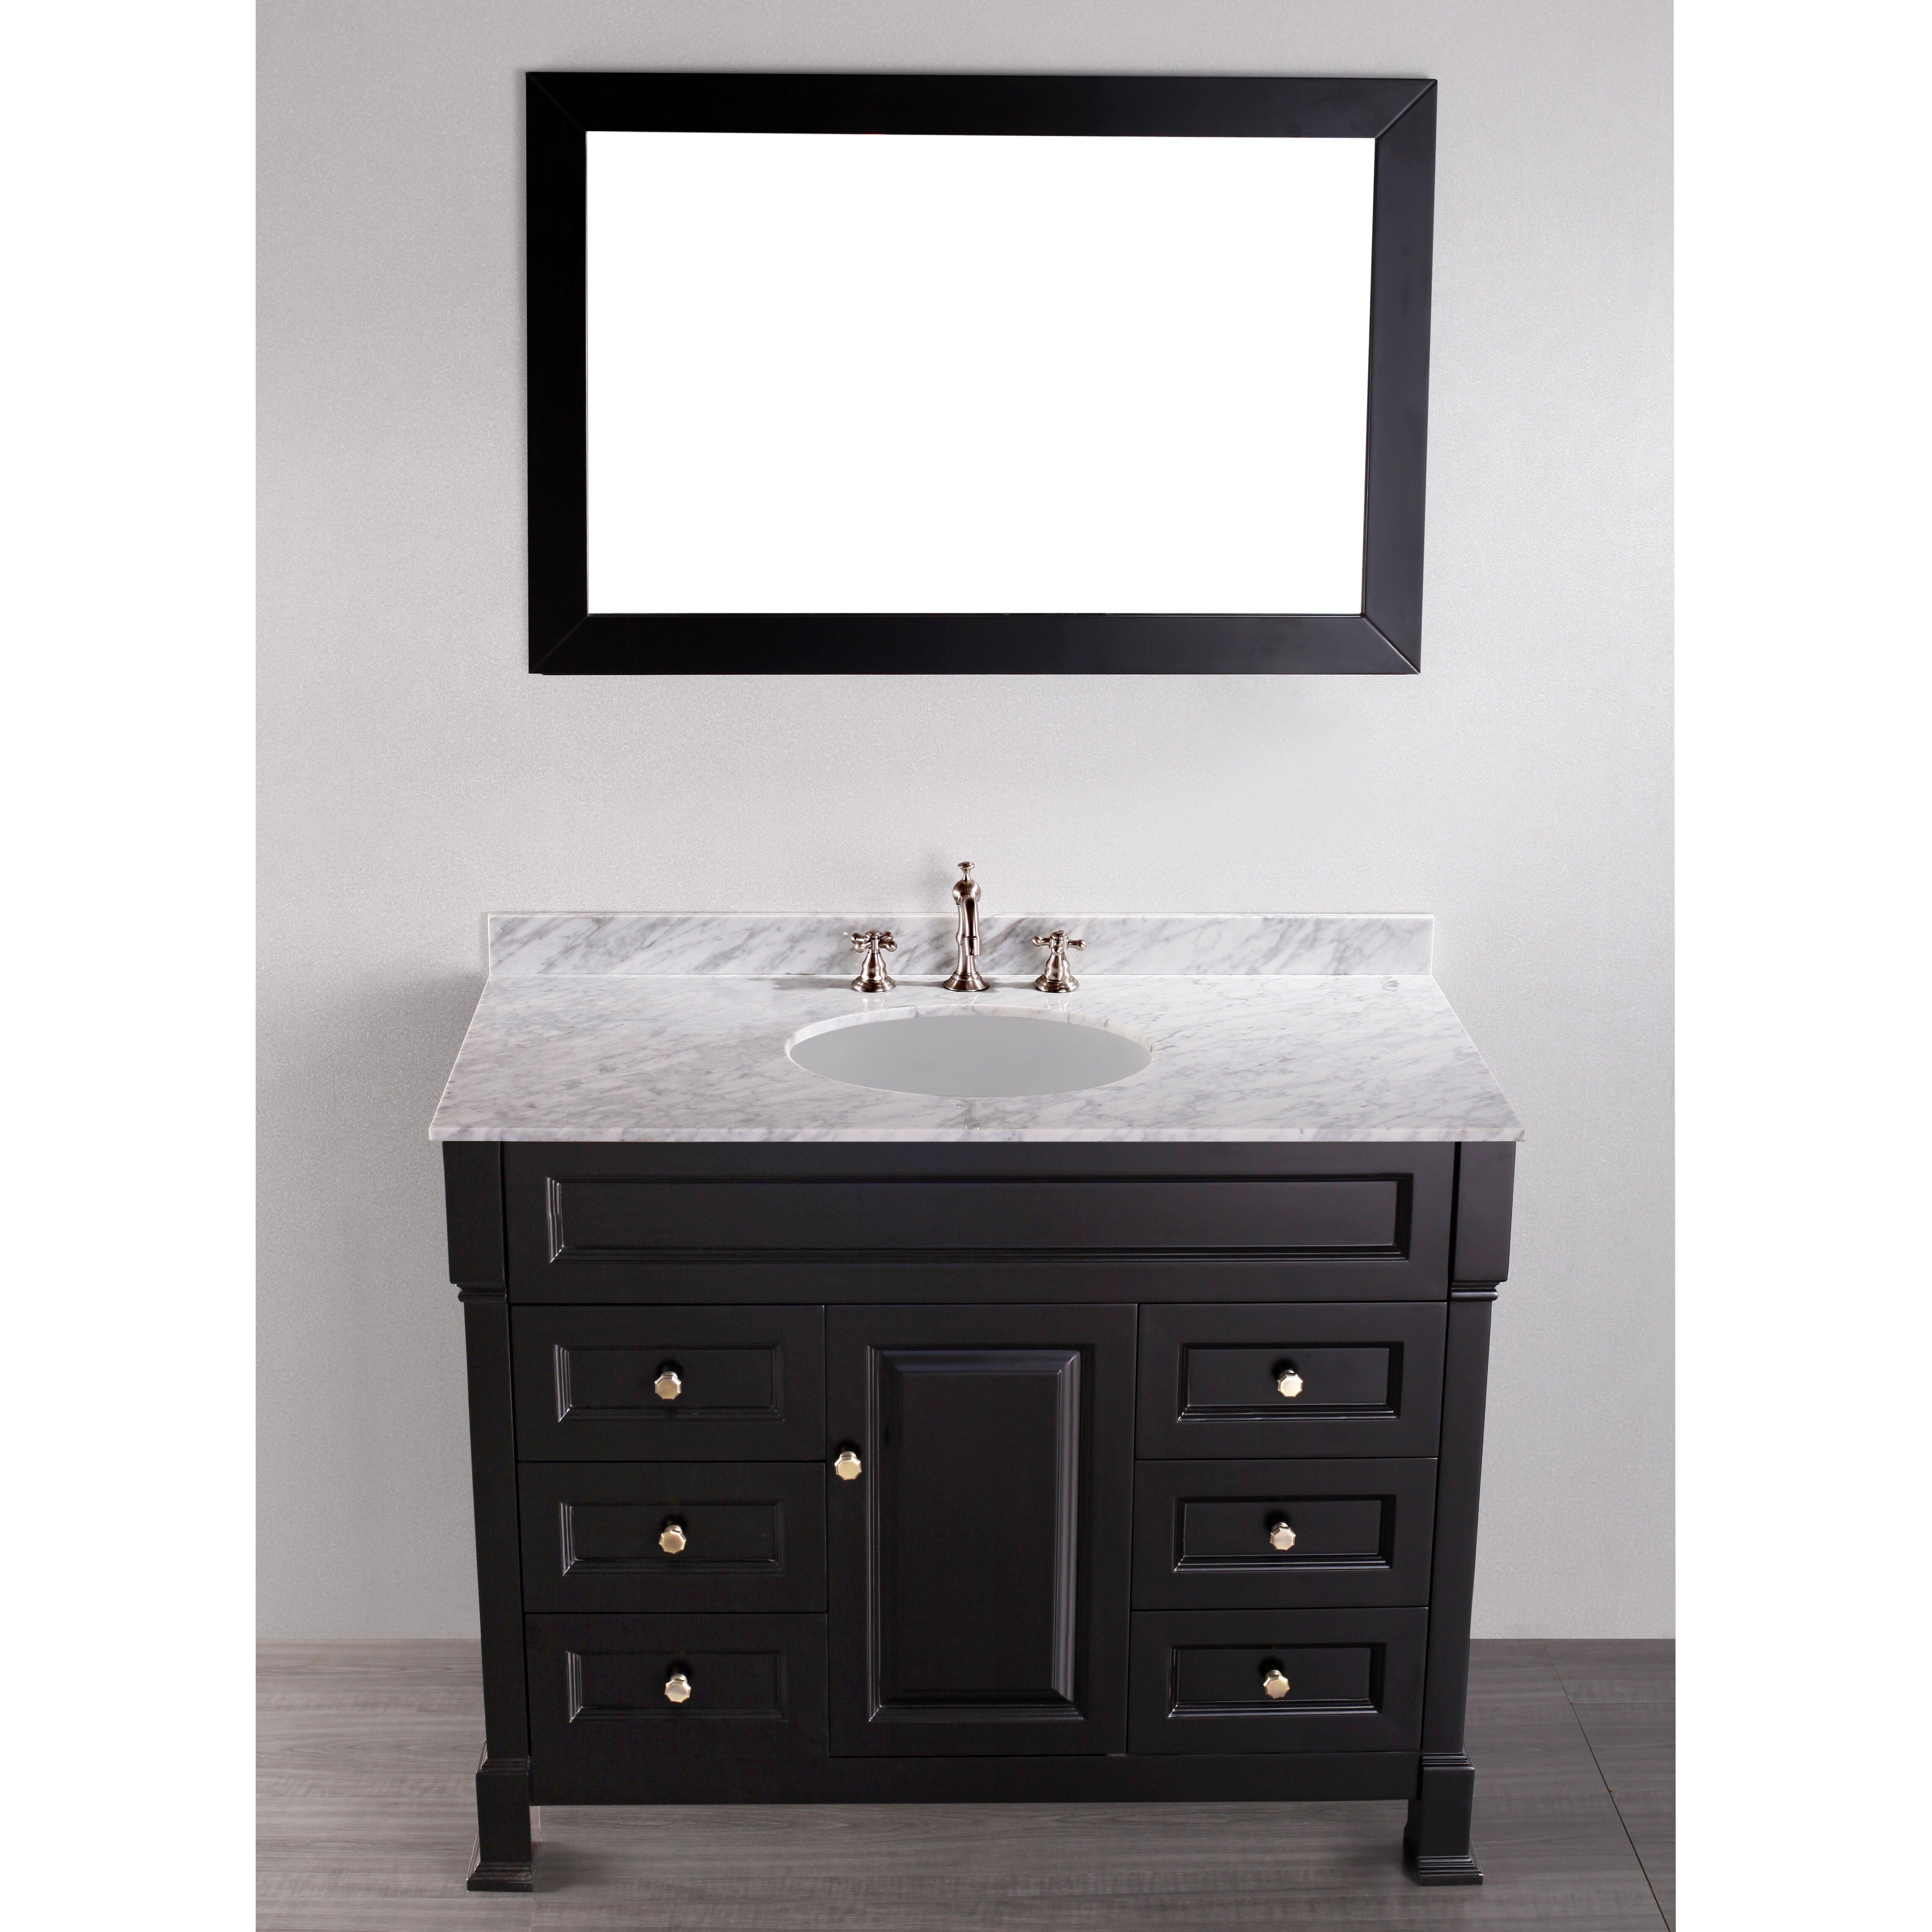 Bosconi contemporary 43 single bathroom vanity set with for Vanity and mirror set